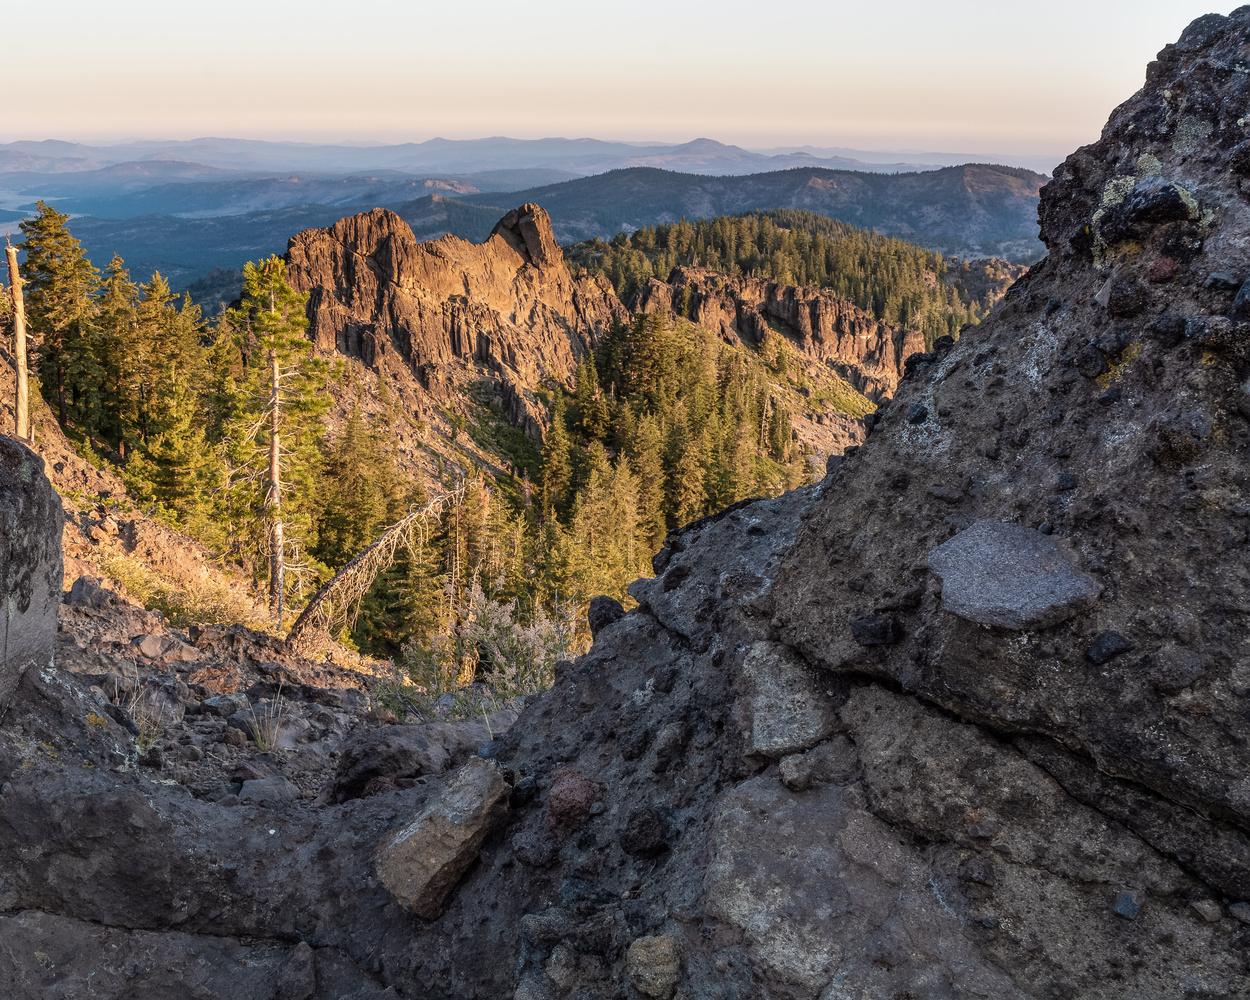 Sunrise over the Ridge by Richie Bednarski